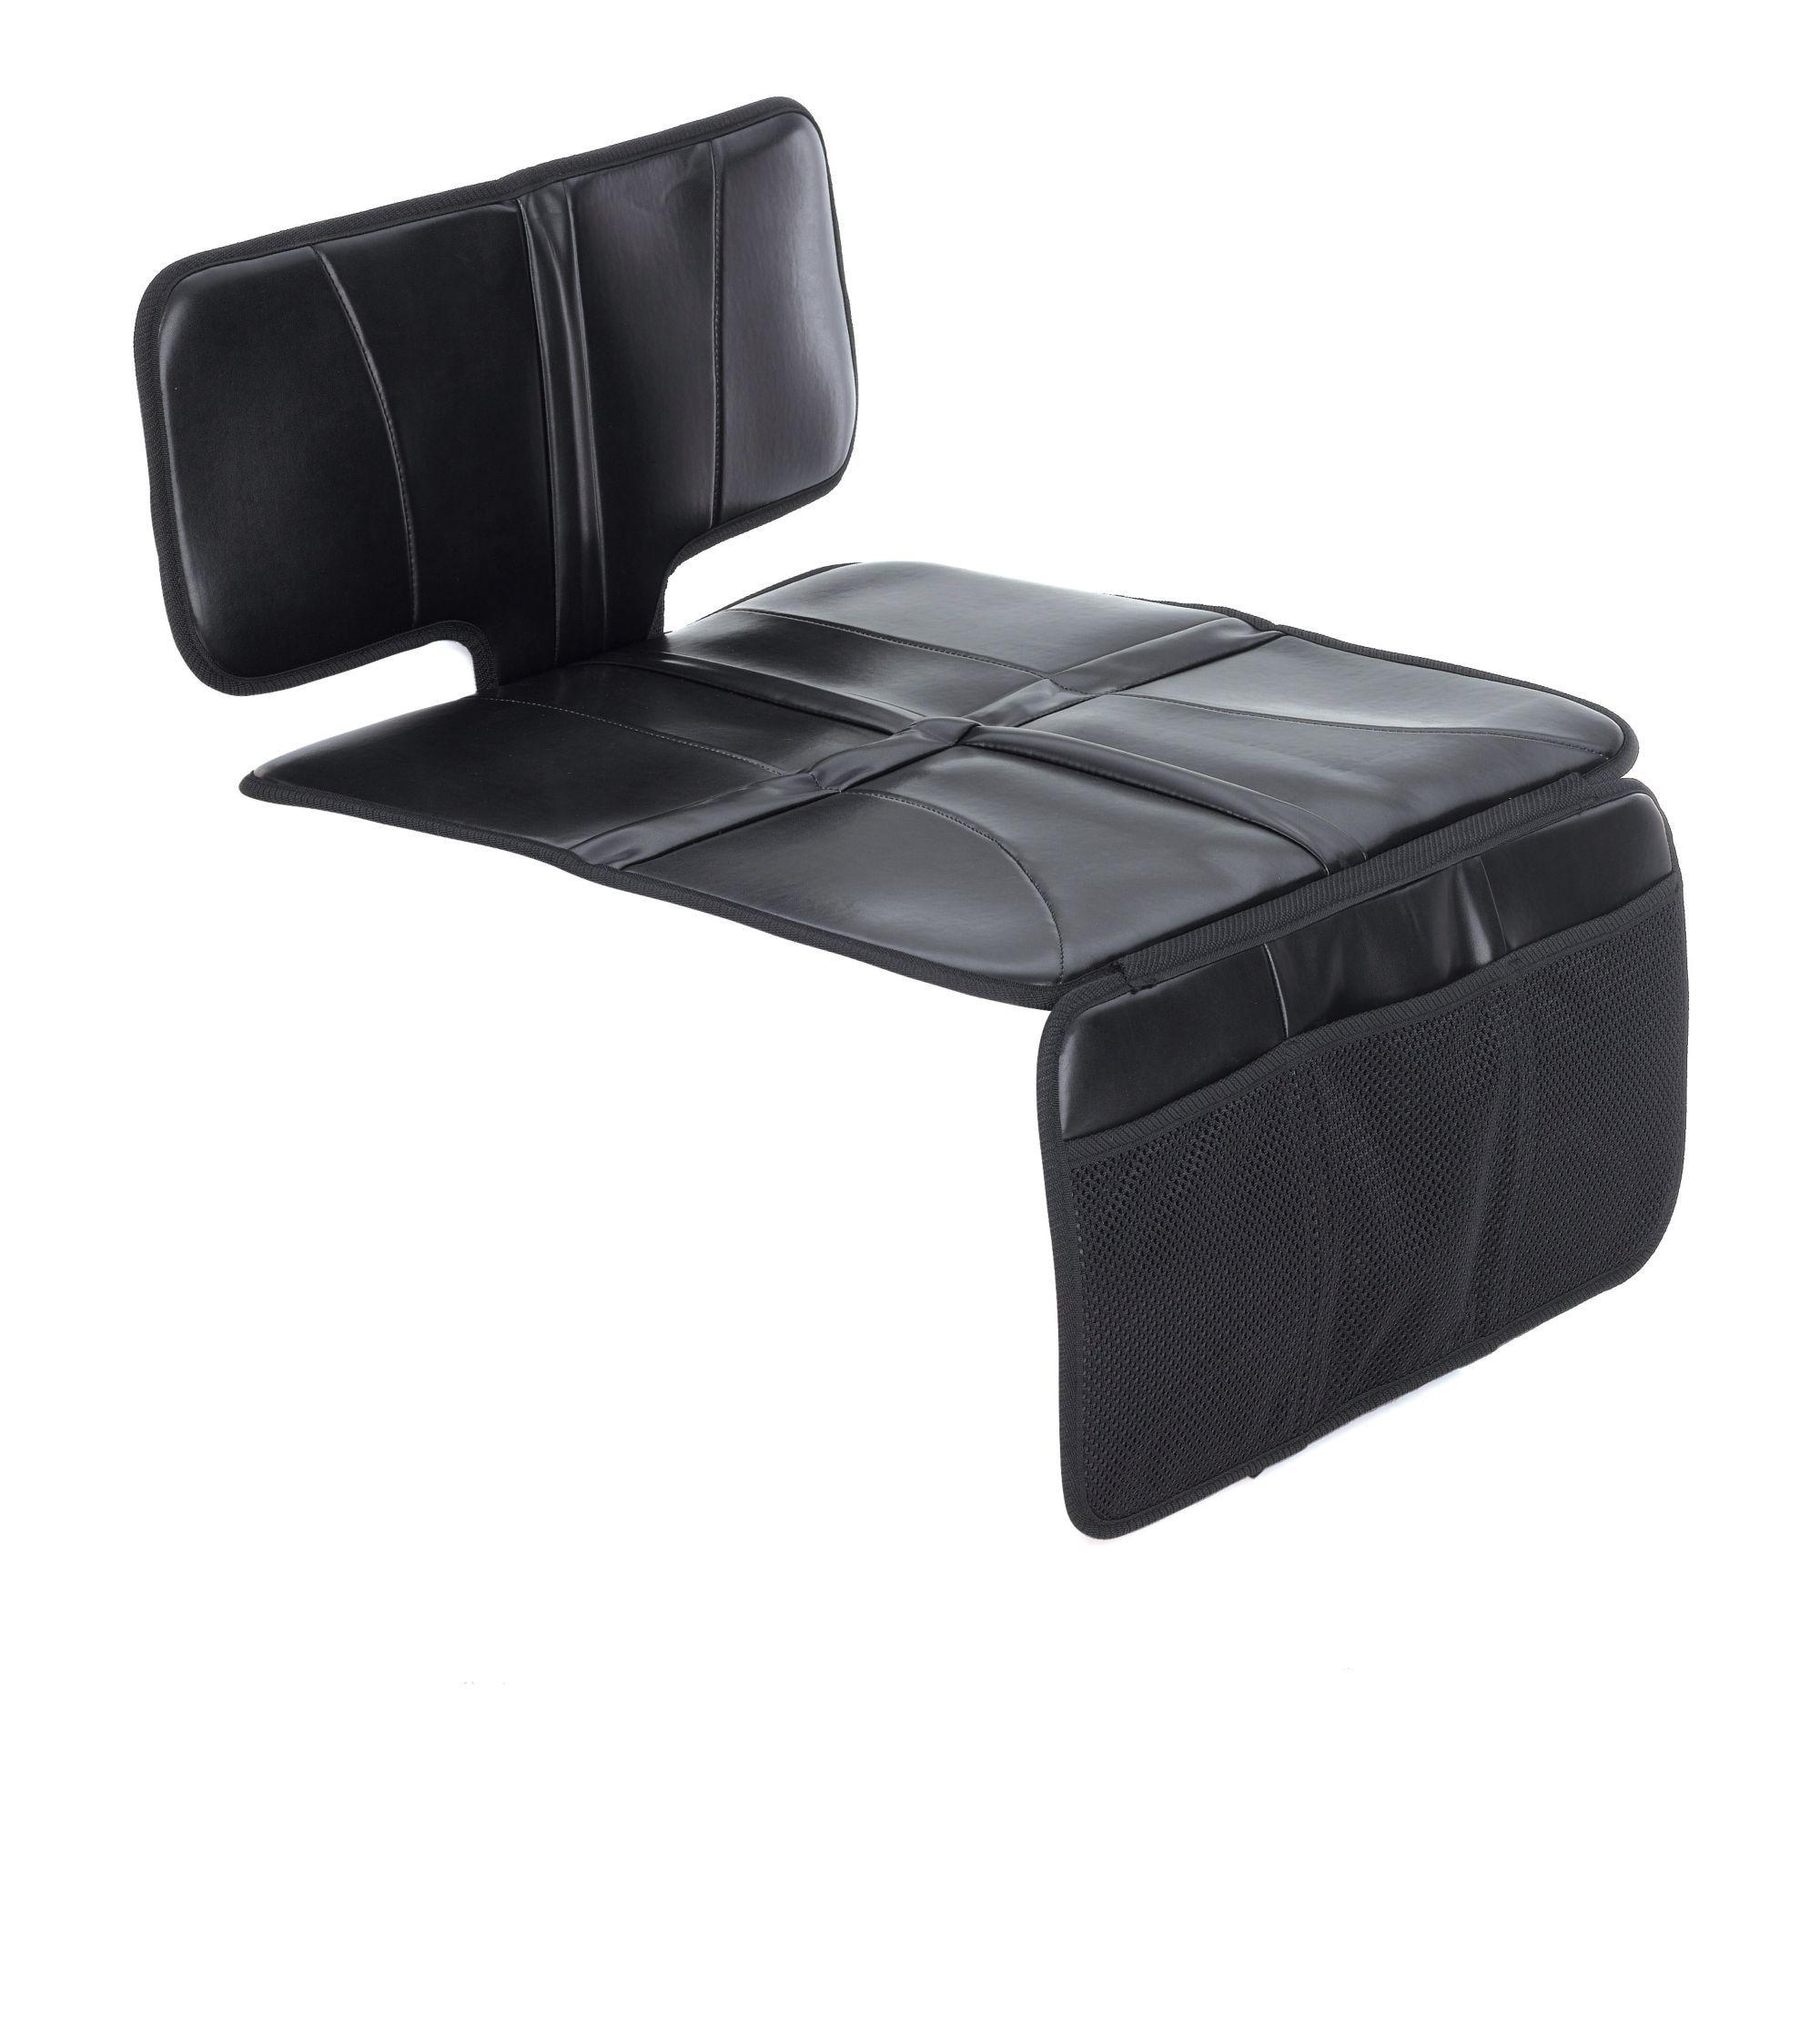 Britax Car Seat Protector Black Car seat protector